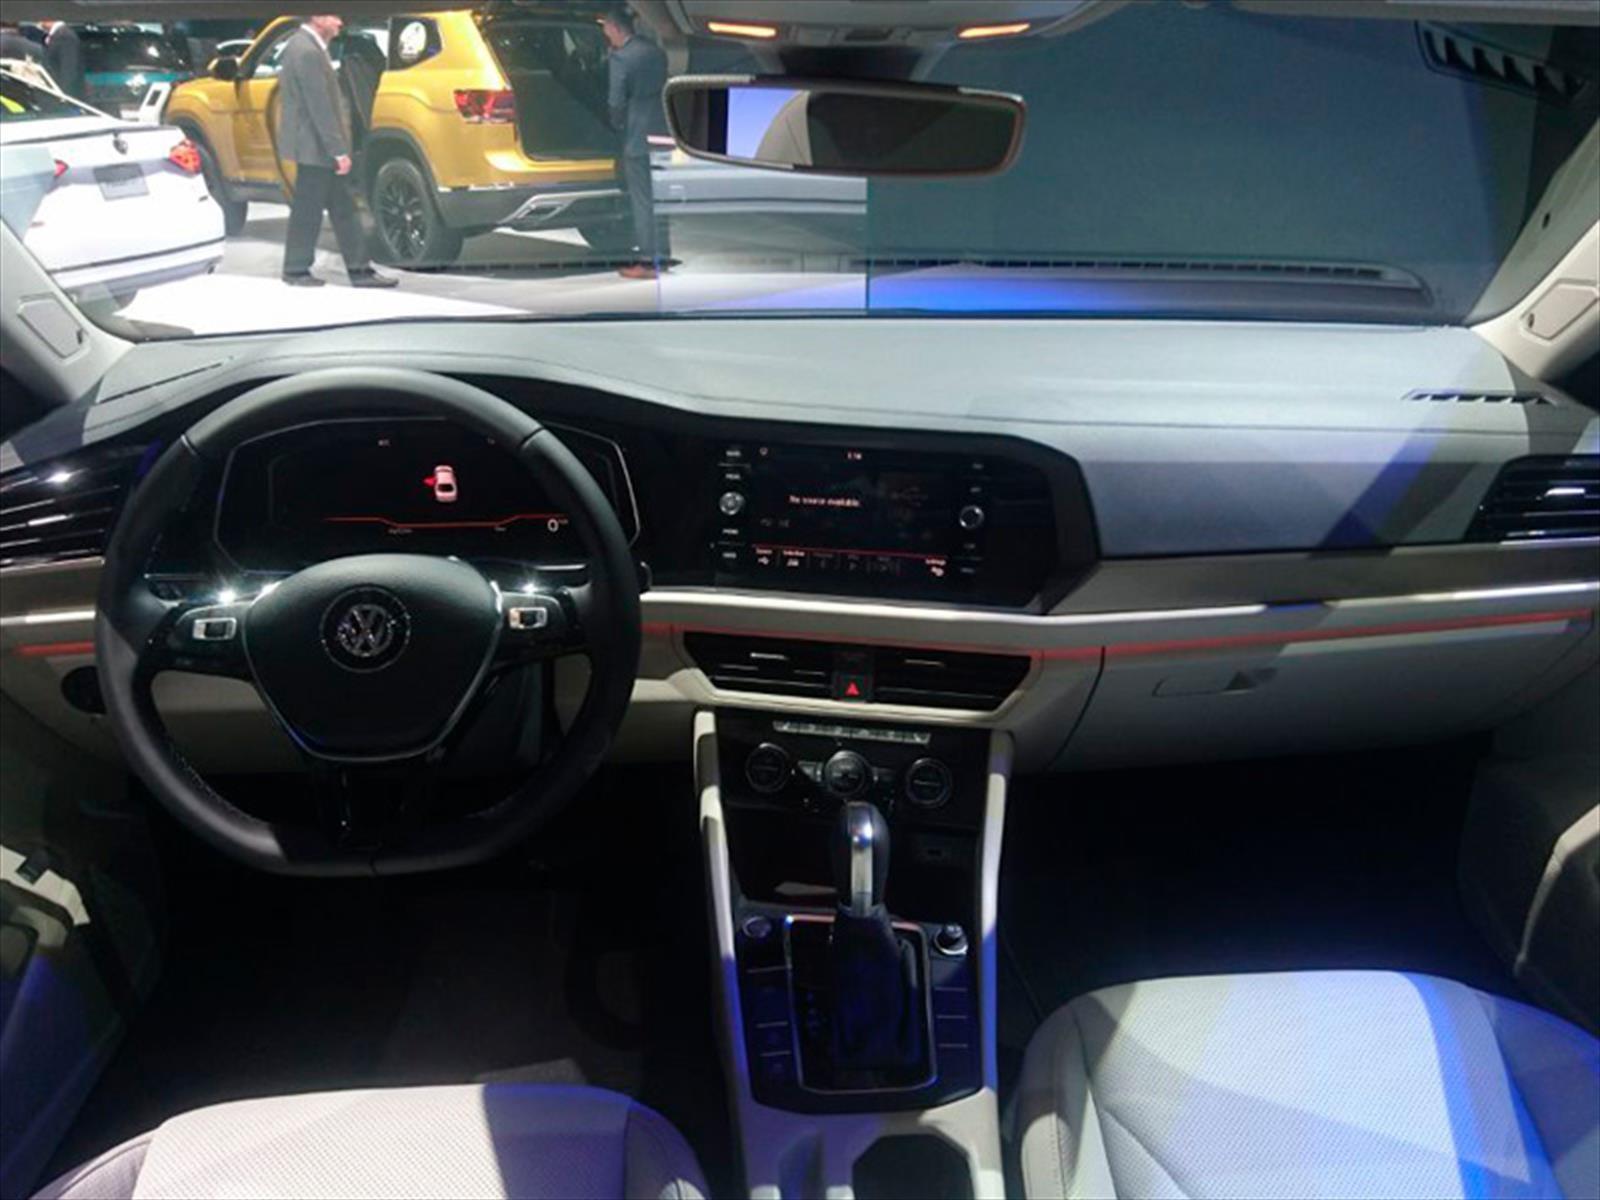 volkswagen jetta 2019 llega a m u00e9xico en marzo de este a u00f1o autocosmos com How Much Is a Audi R8 Audi R8 Automatic